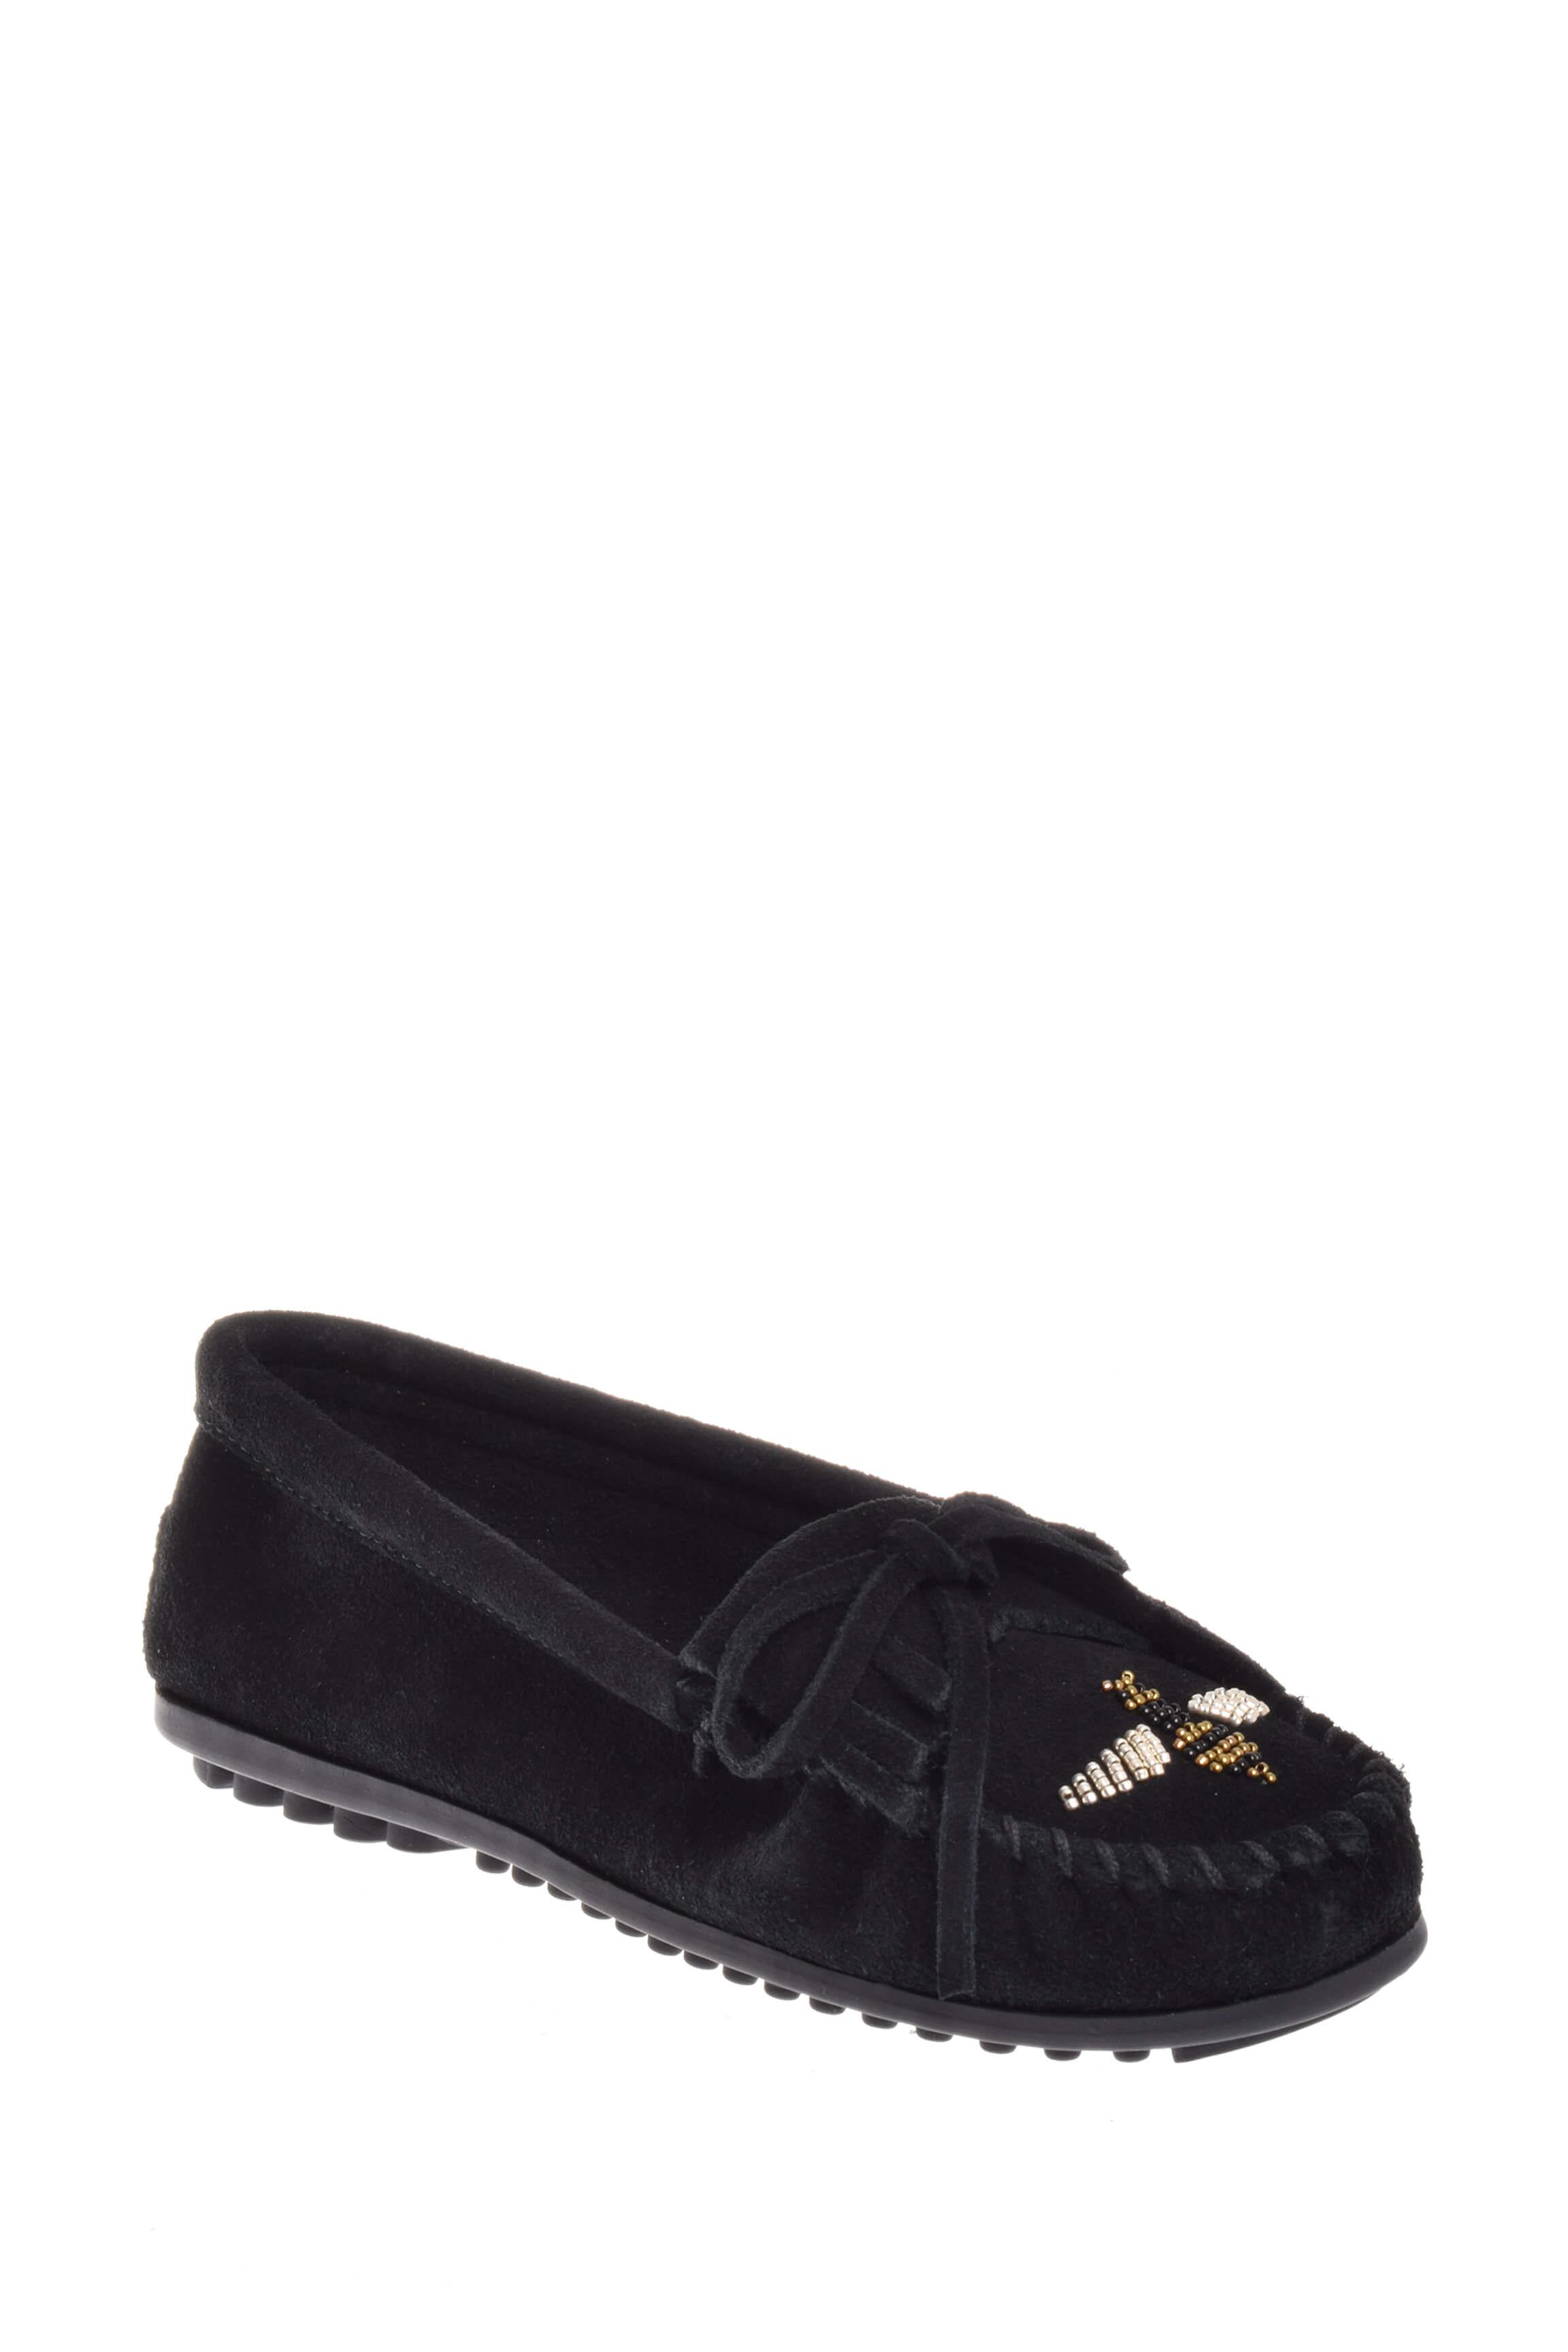 Click here to buy Minnetonka 419H Minnetonka X Moko Moc Loafer Black.